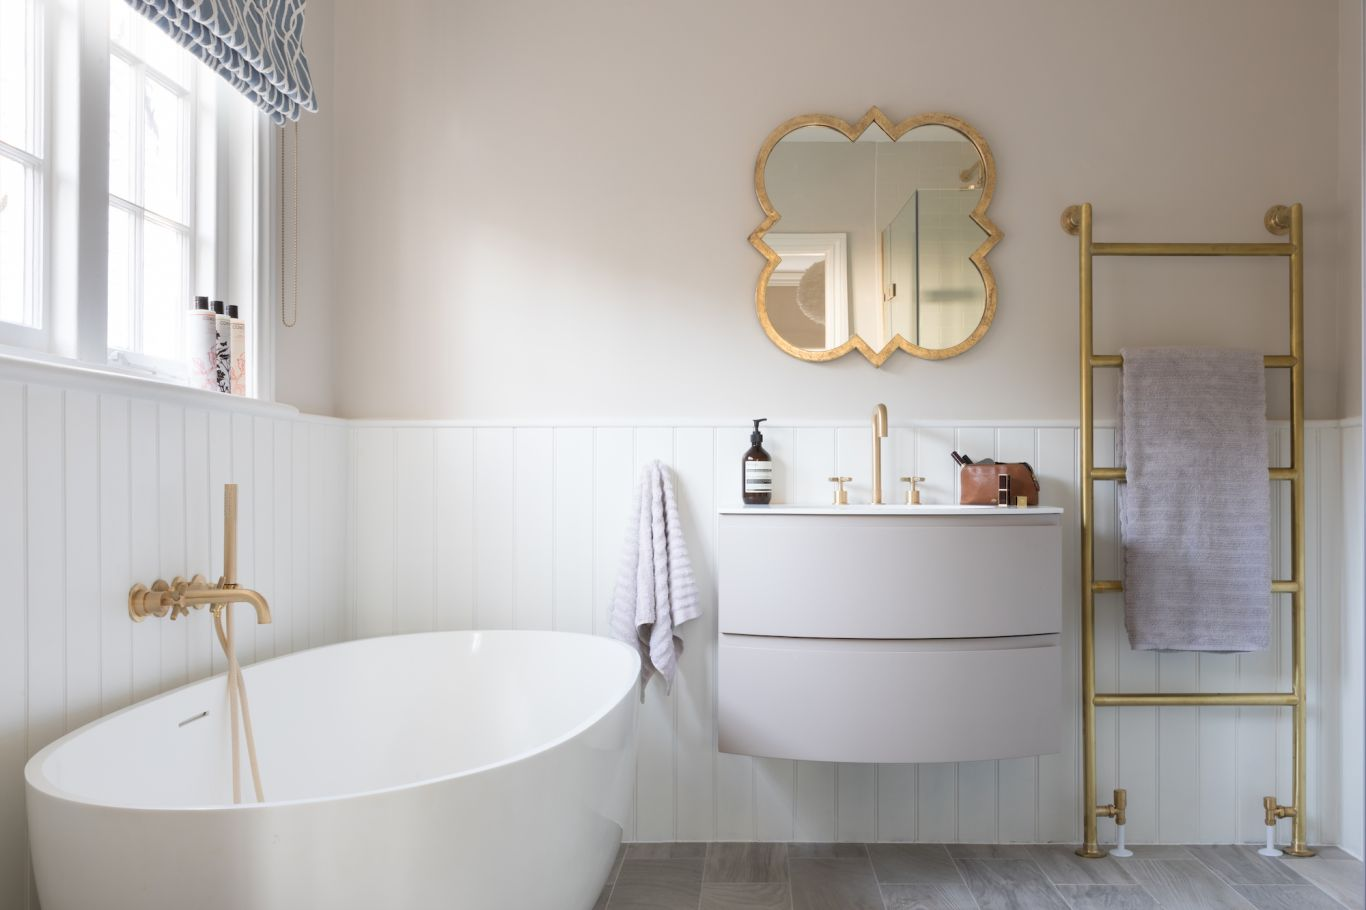 West One Bathrooms Country Bathoom